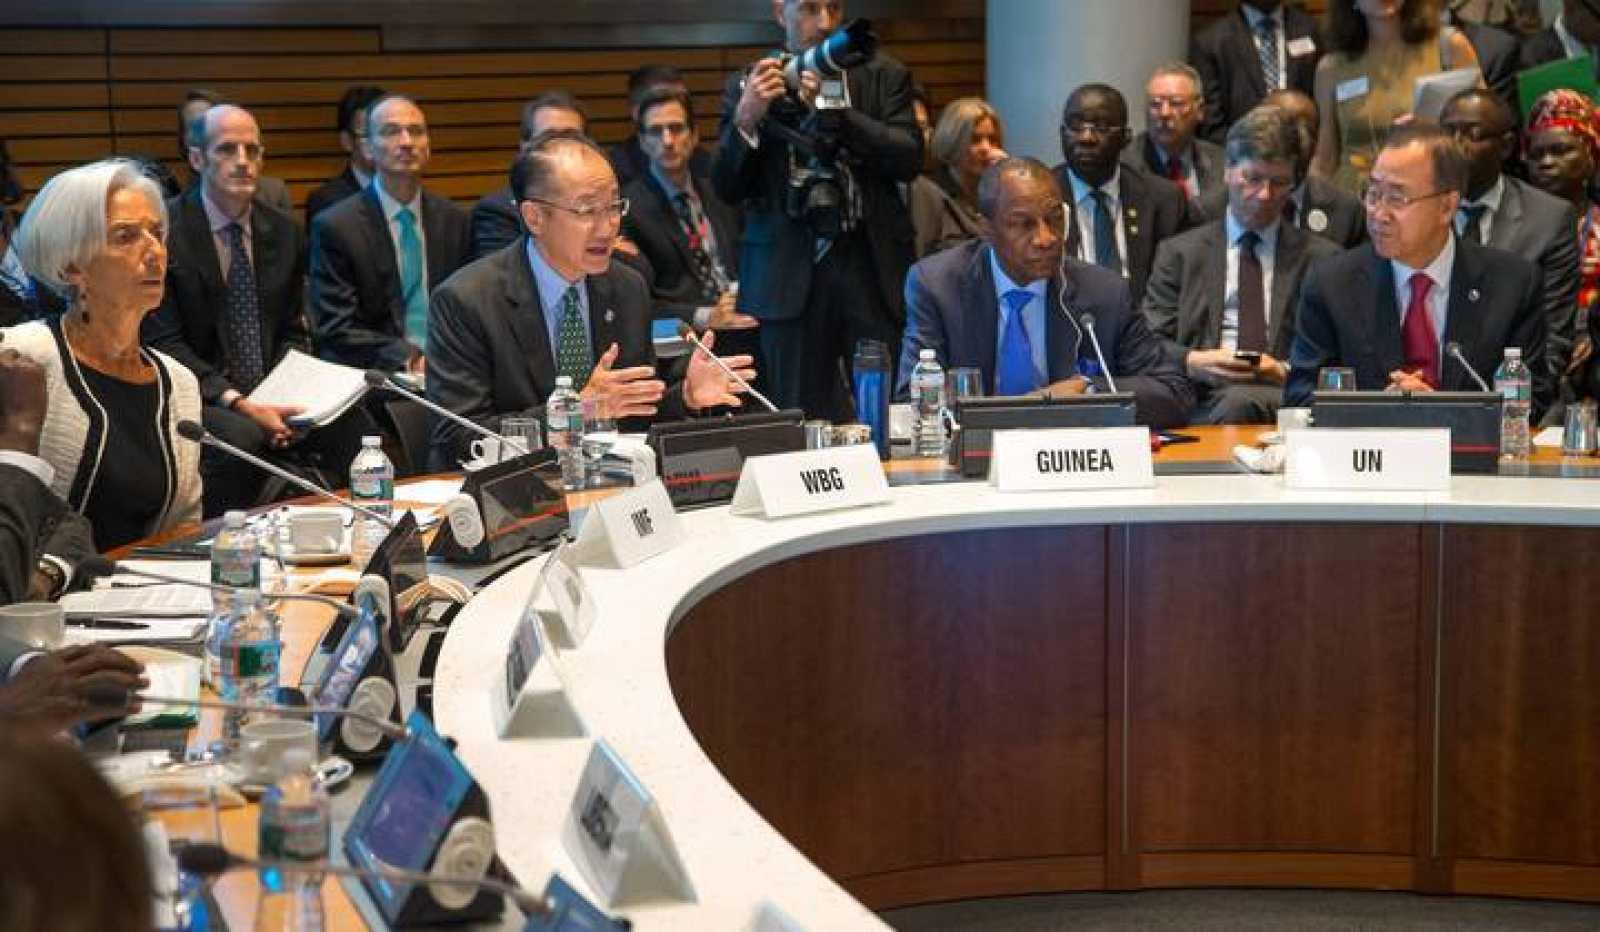 IMF Managing Director Lagarde, World Bank Group President Jim Yong Kim, Guinea's President Conde and UN Secretary-General Ban Ki-moon address the Ebola crisis during the IMF-World Bank annual meetings in Washington